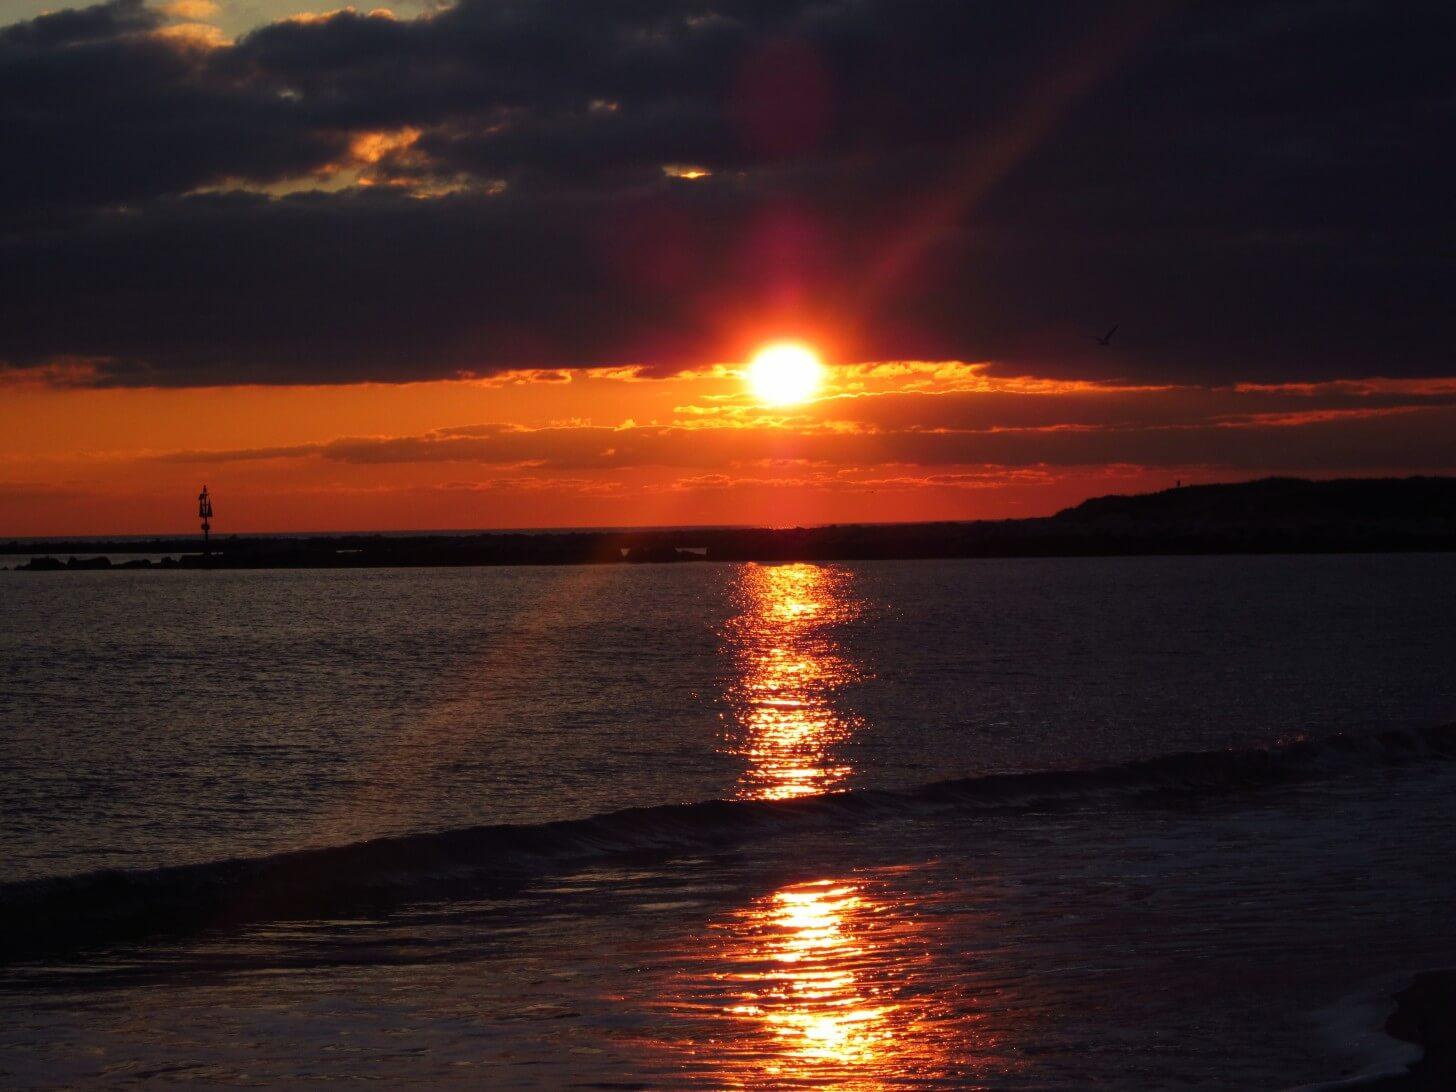 Galilee, Fishing Village, Rhode Island, Faces Interview Paul Magnanti